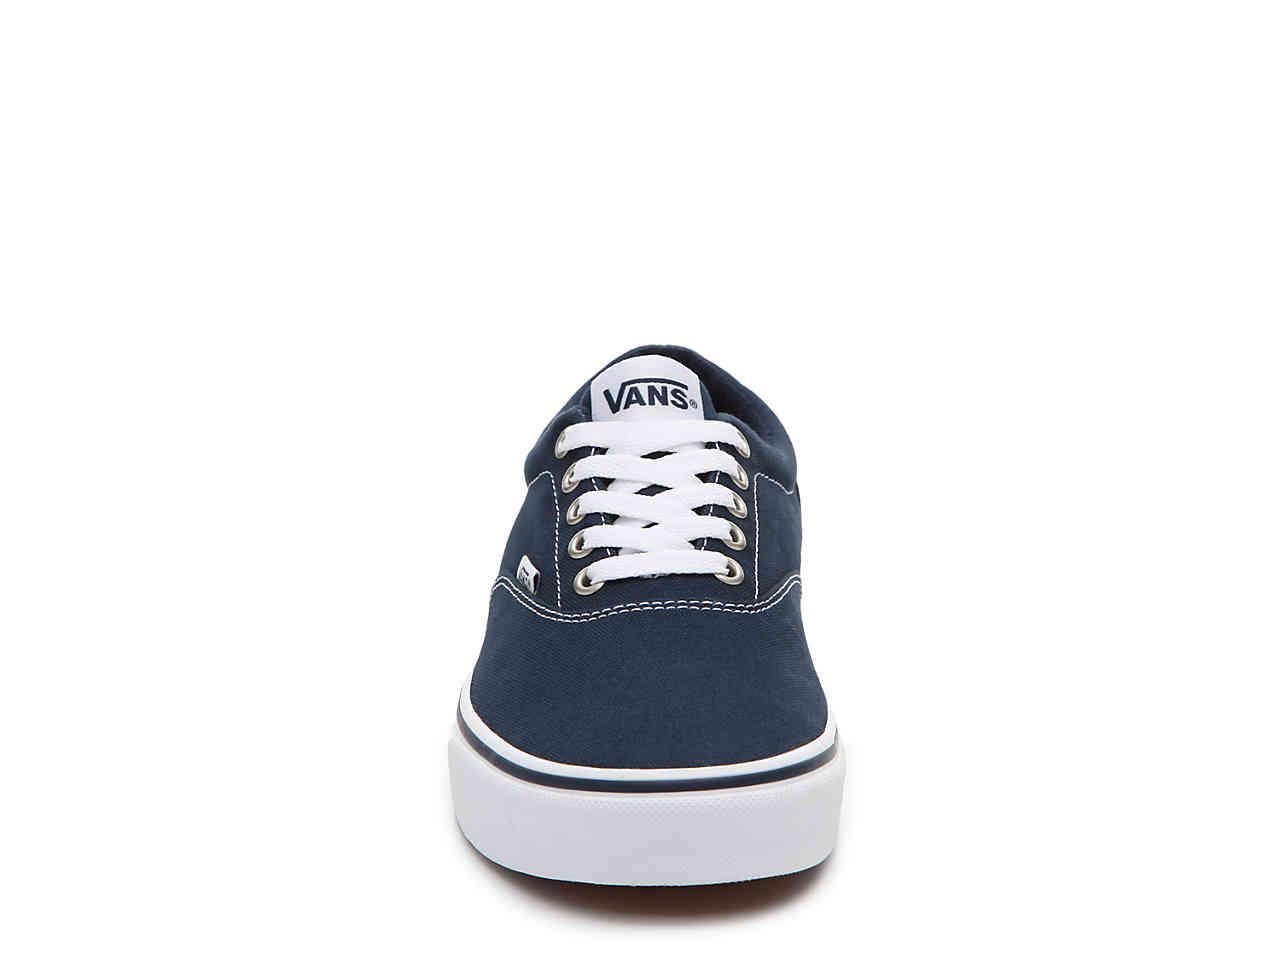 5eacefc58b01e7 Lyst - Vans Doheny Sneaker in Blue for Men